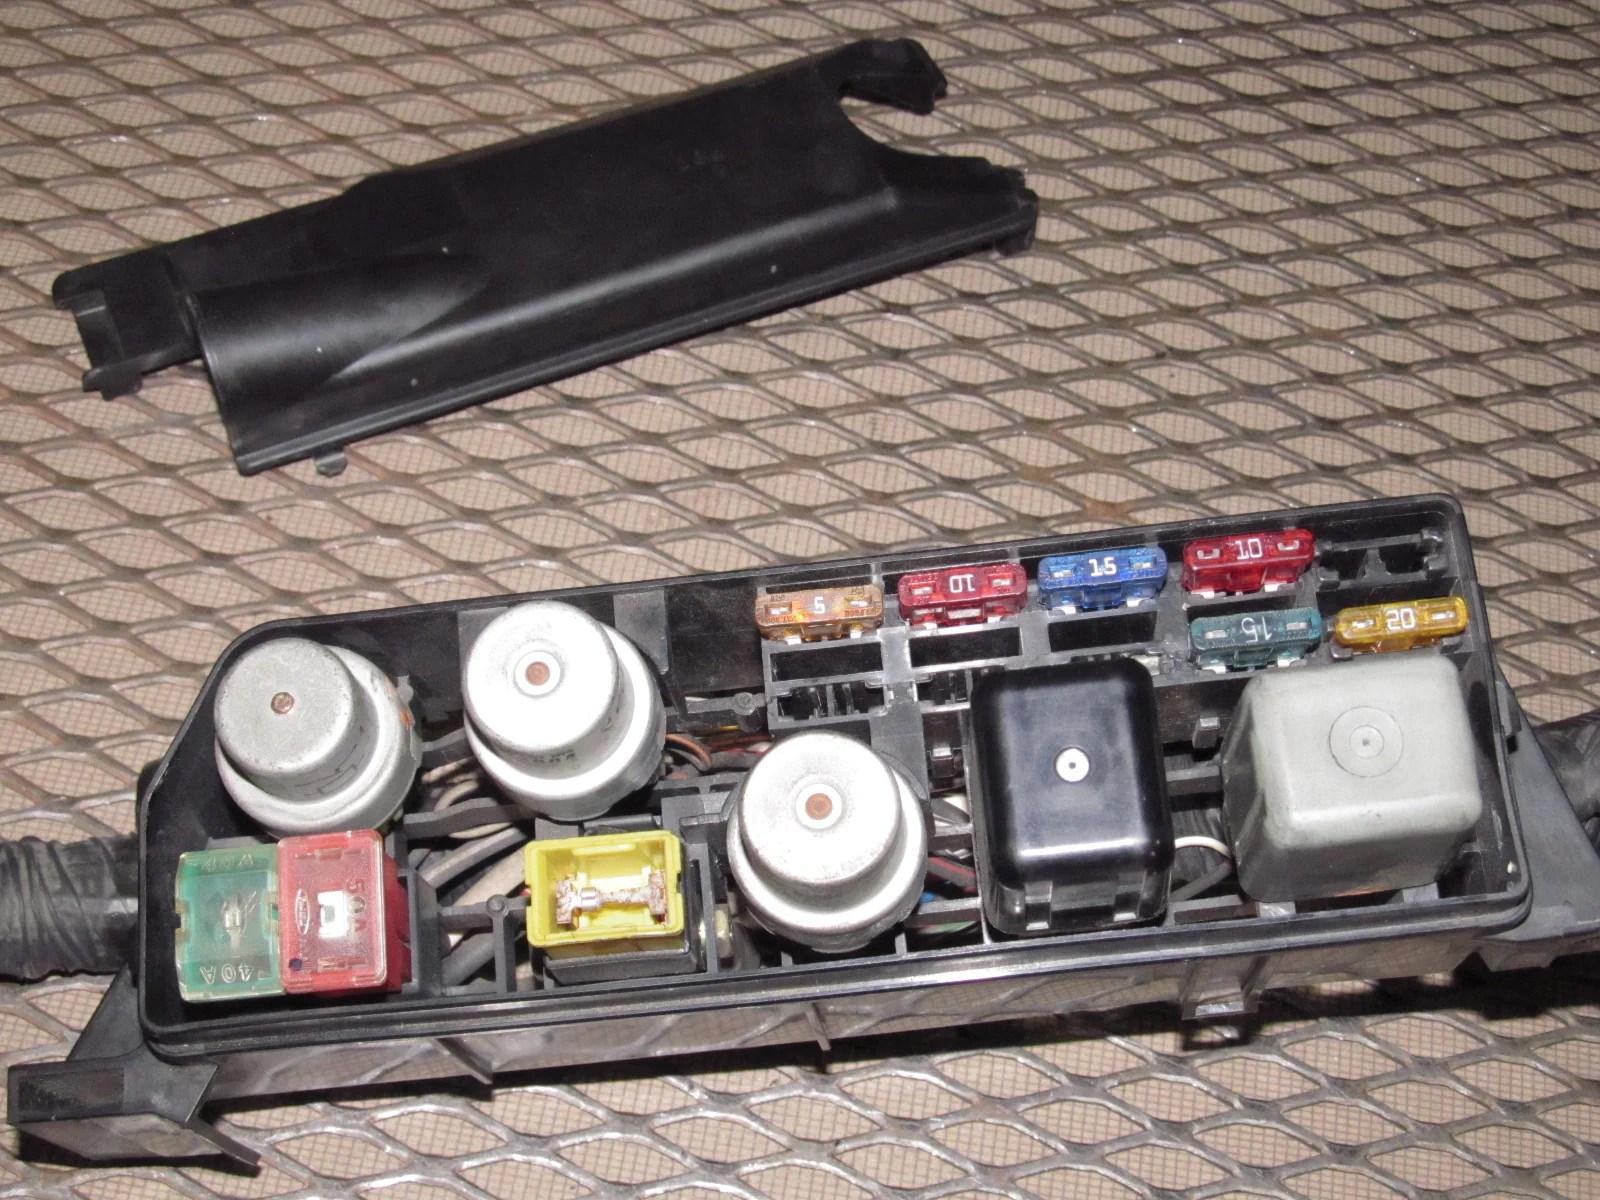 85 86 toyota mr2 oem engine fuse box  [ 1600 x 1200 Pixel ]